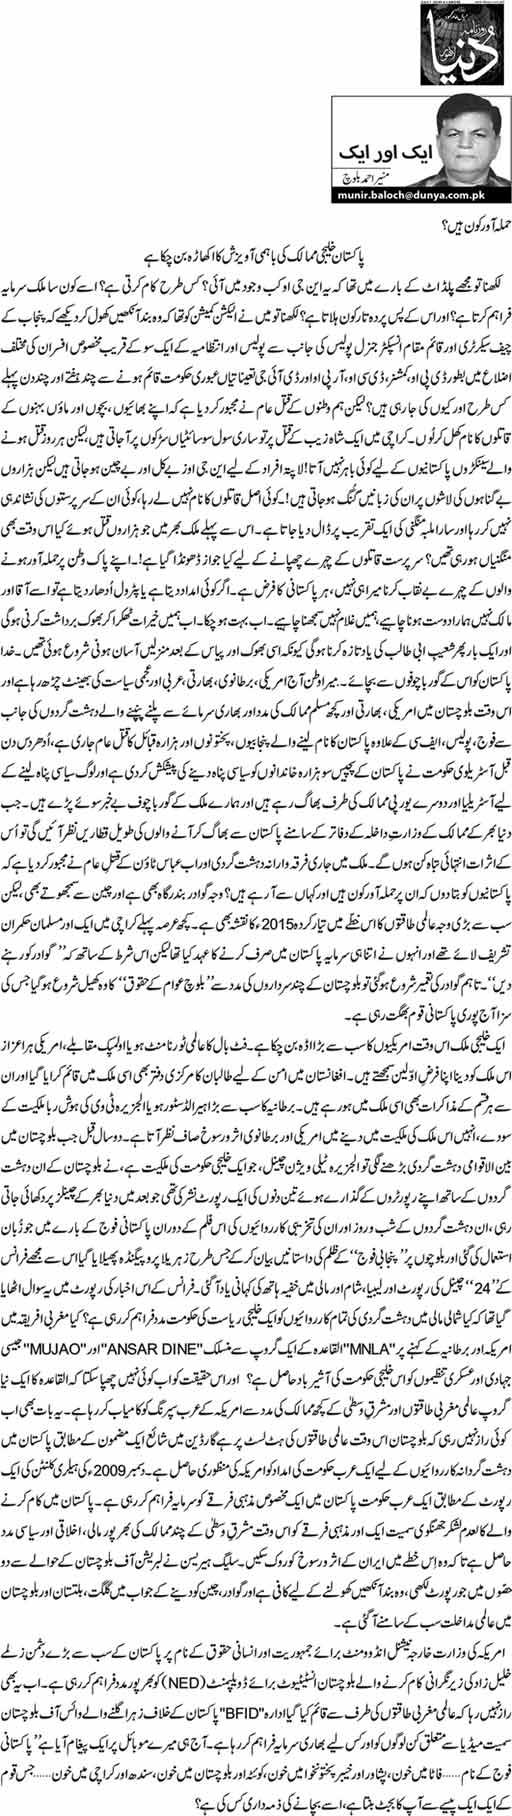 Hamla awar kon hain? - Munir Ahmed Baloch